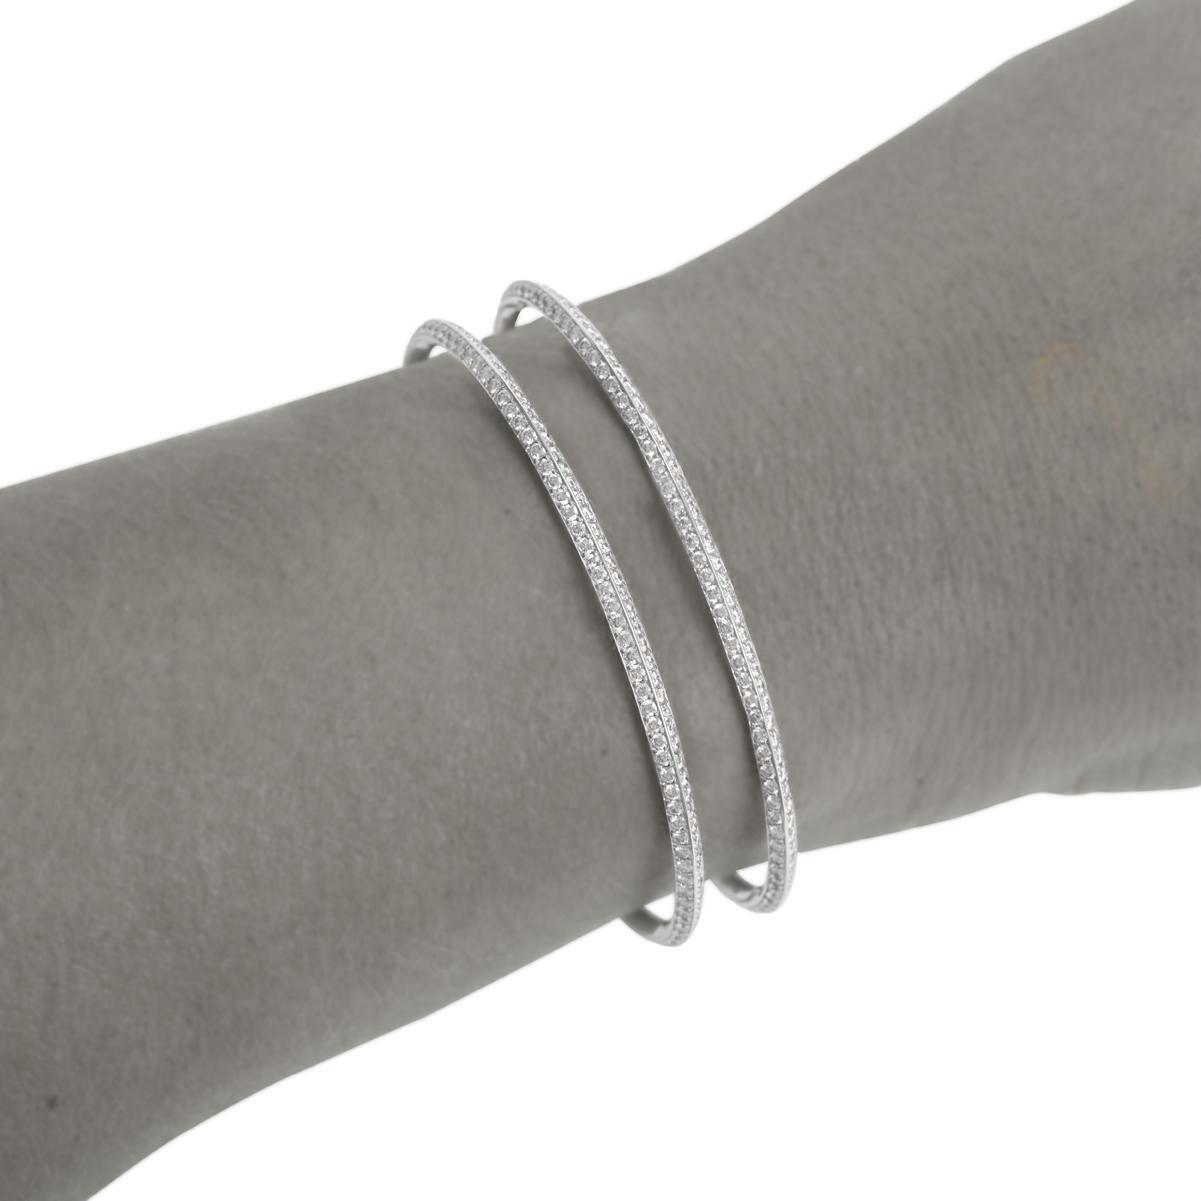 bracelet-poignee-recto-V2V-paris-nb